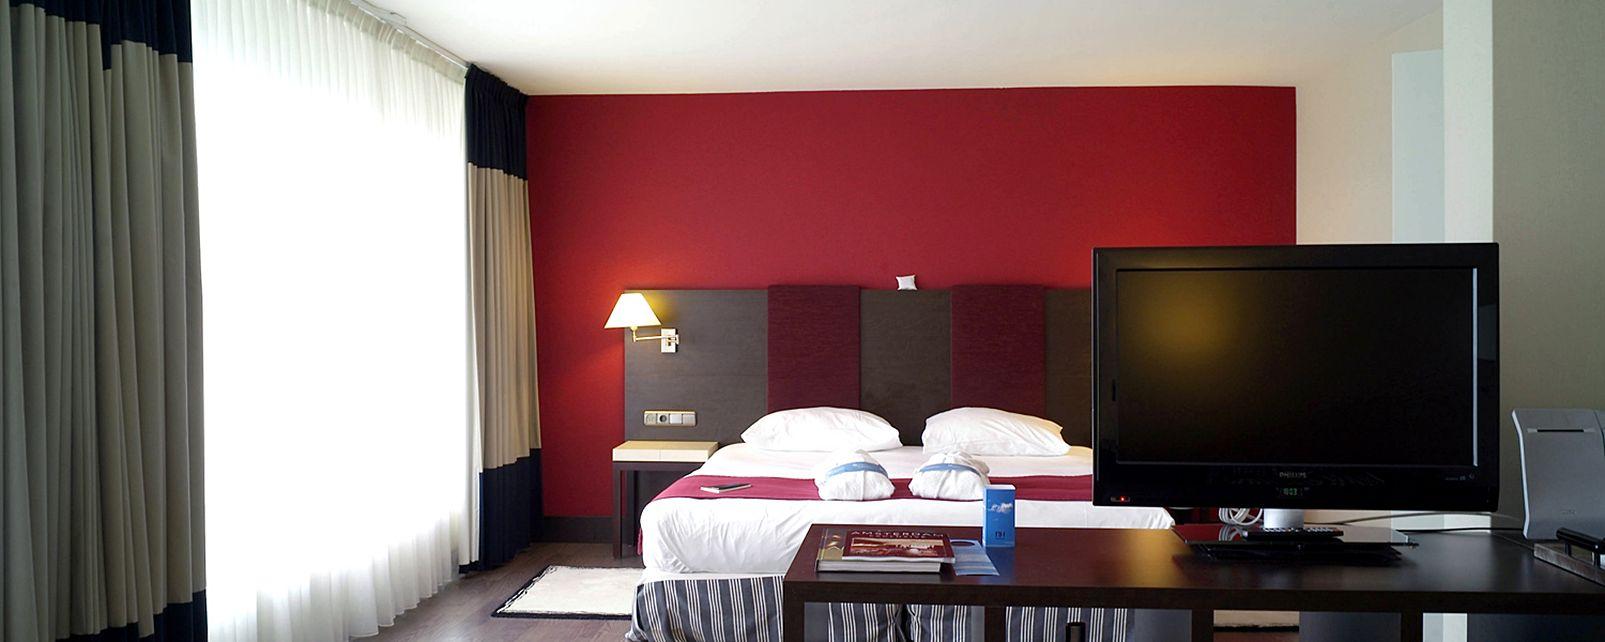 Hotel NH Grand Hotel Krasnapolsky